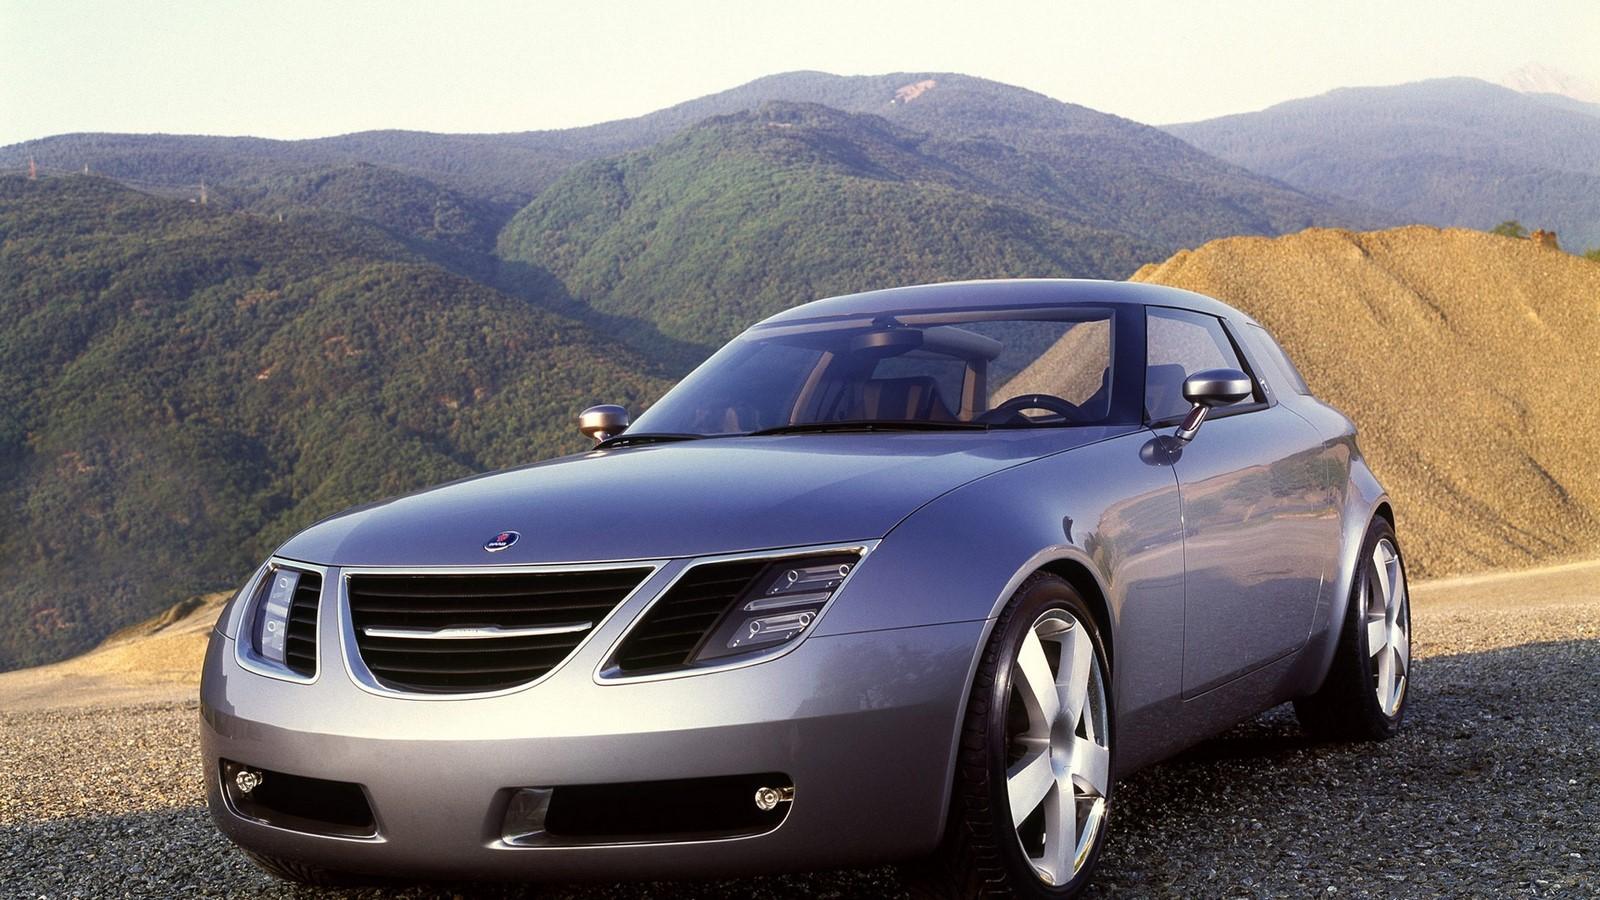 2001-saab-9x-concept (7)